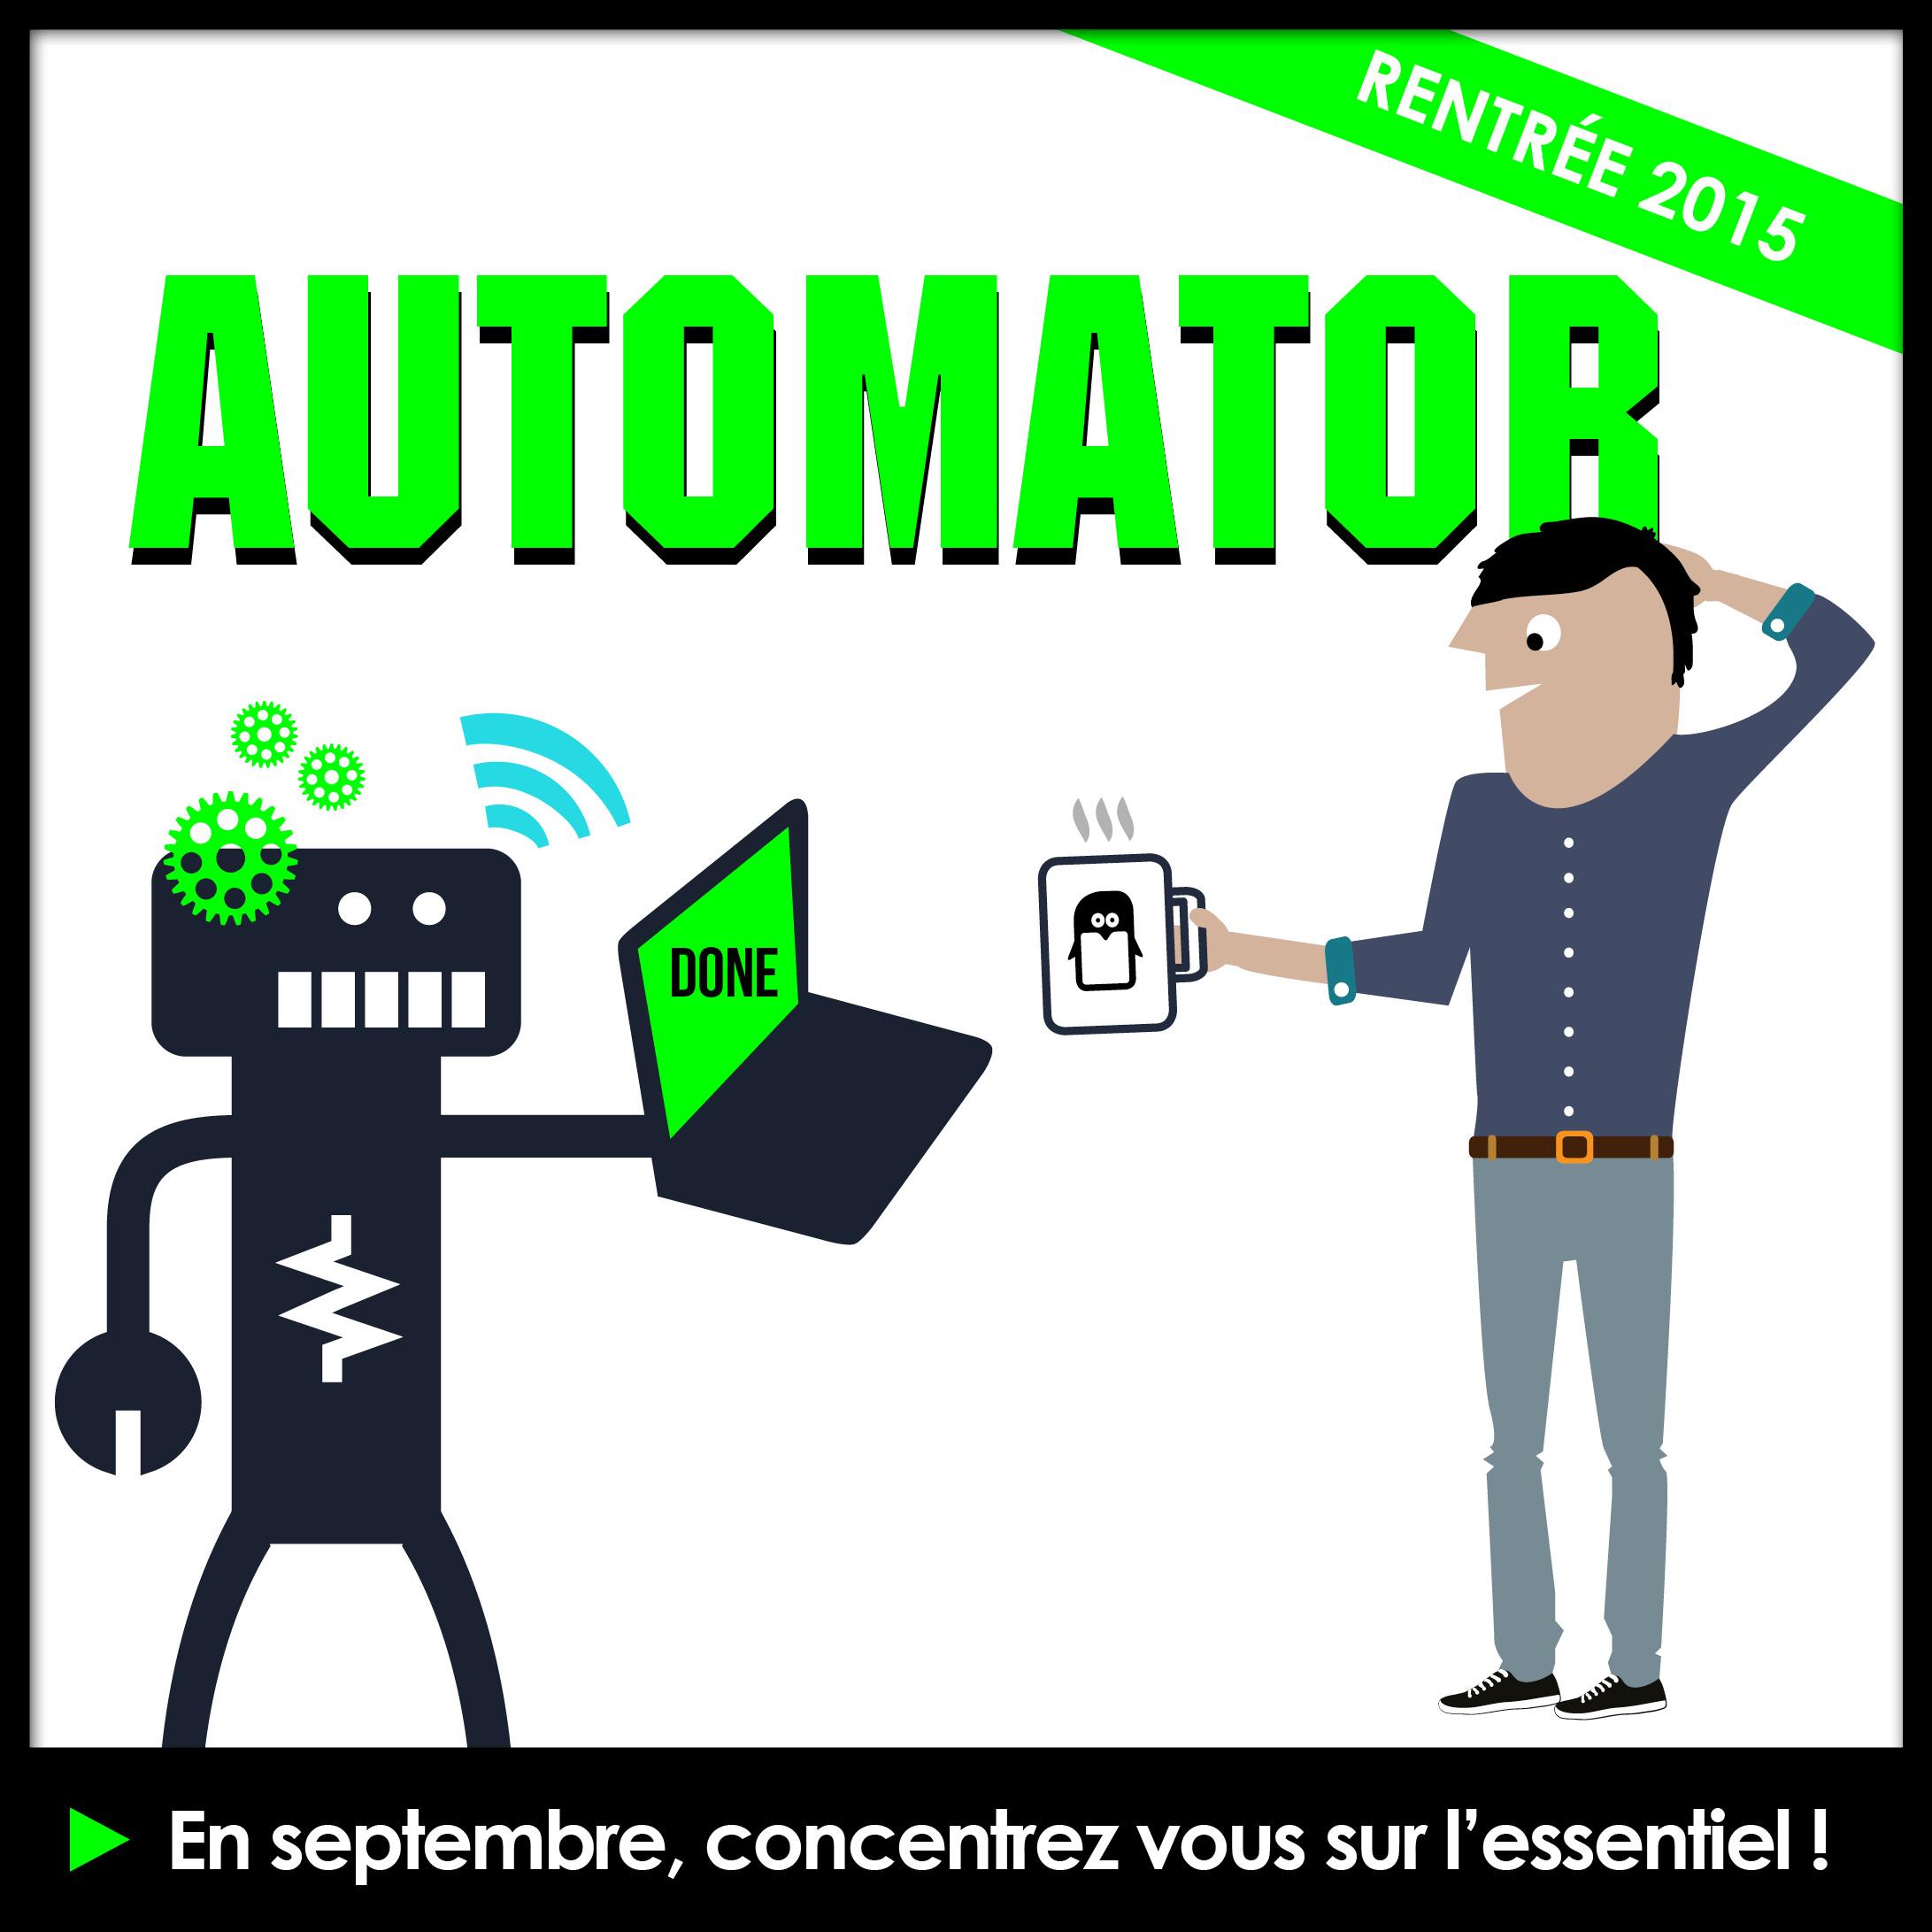 2.Rentre_e_Automator